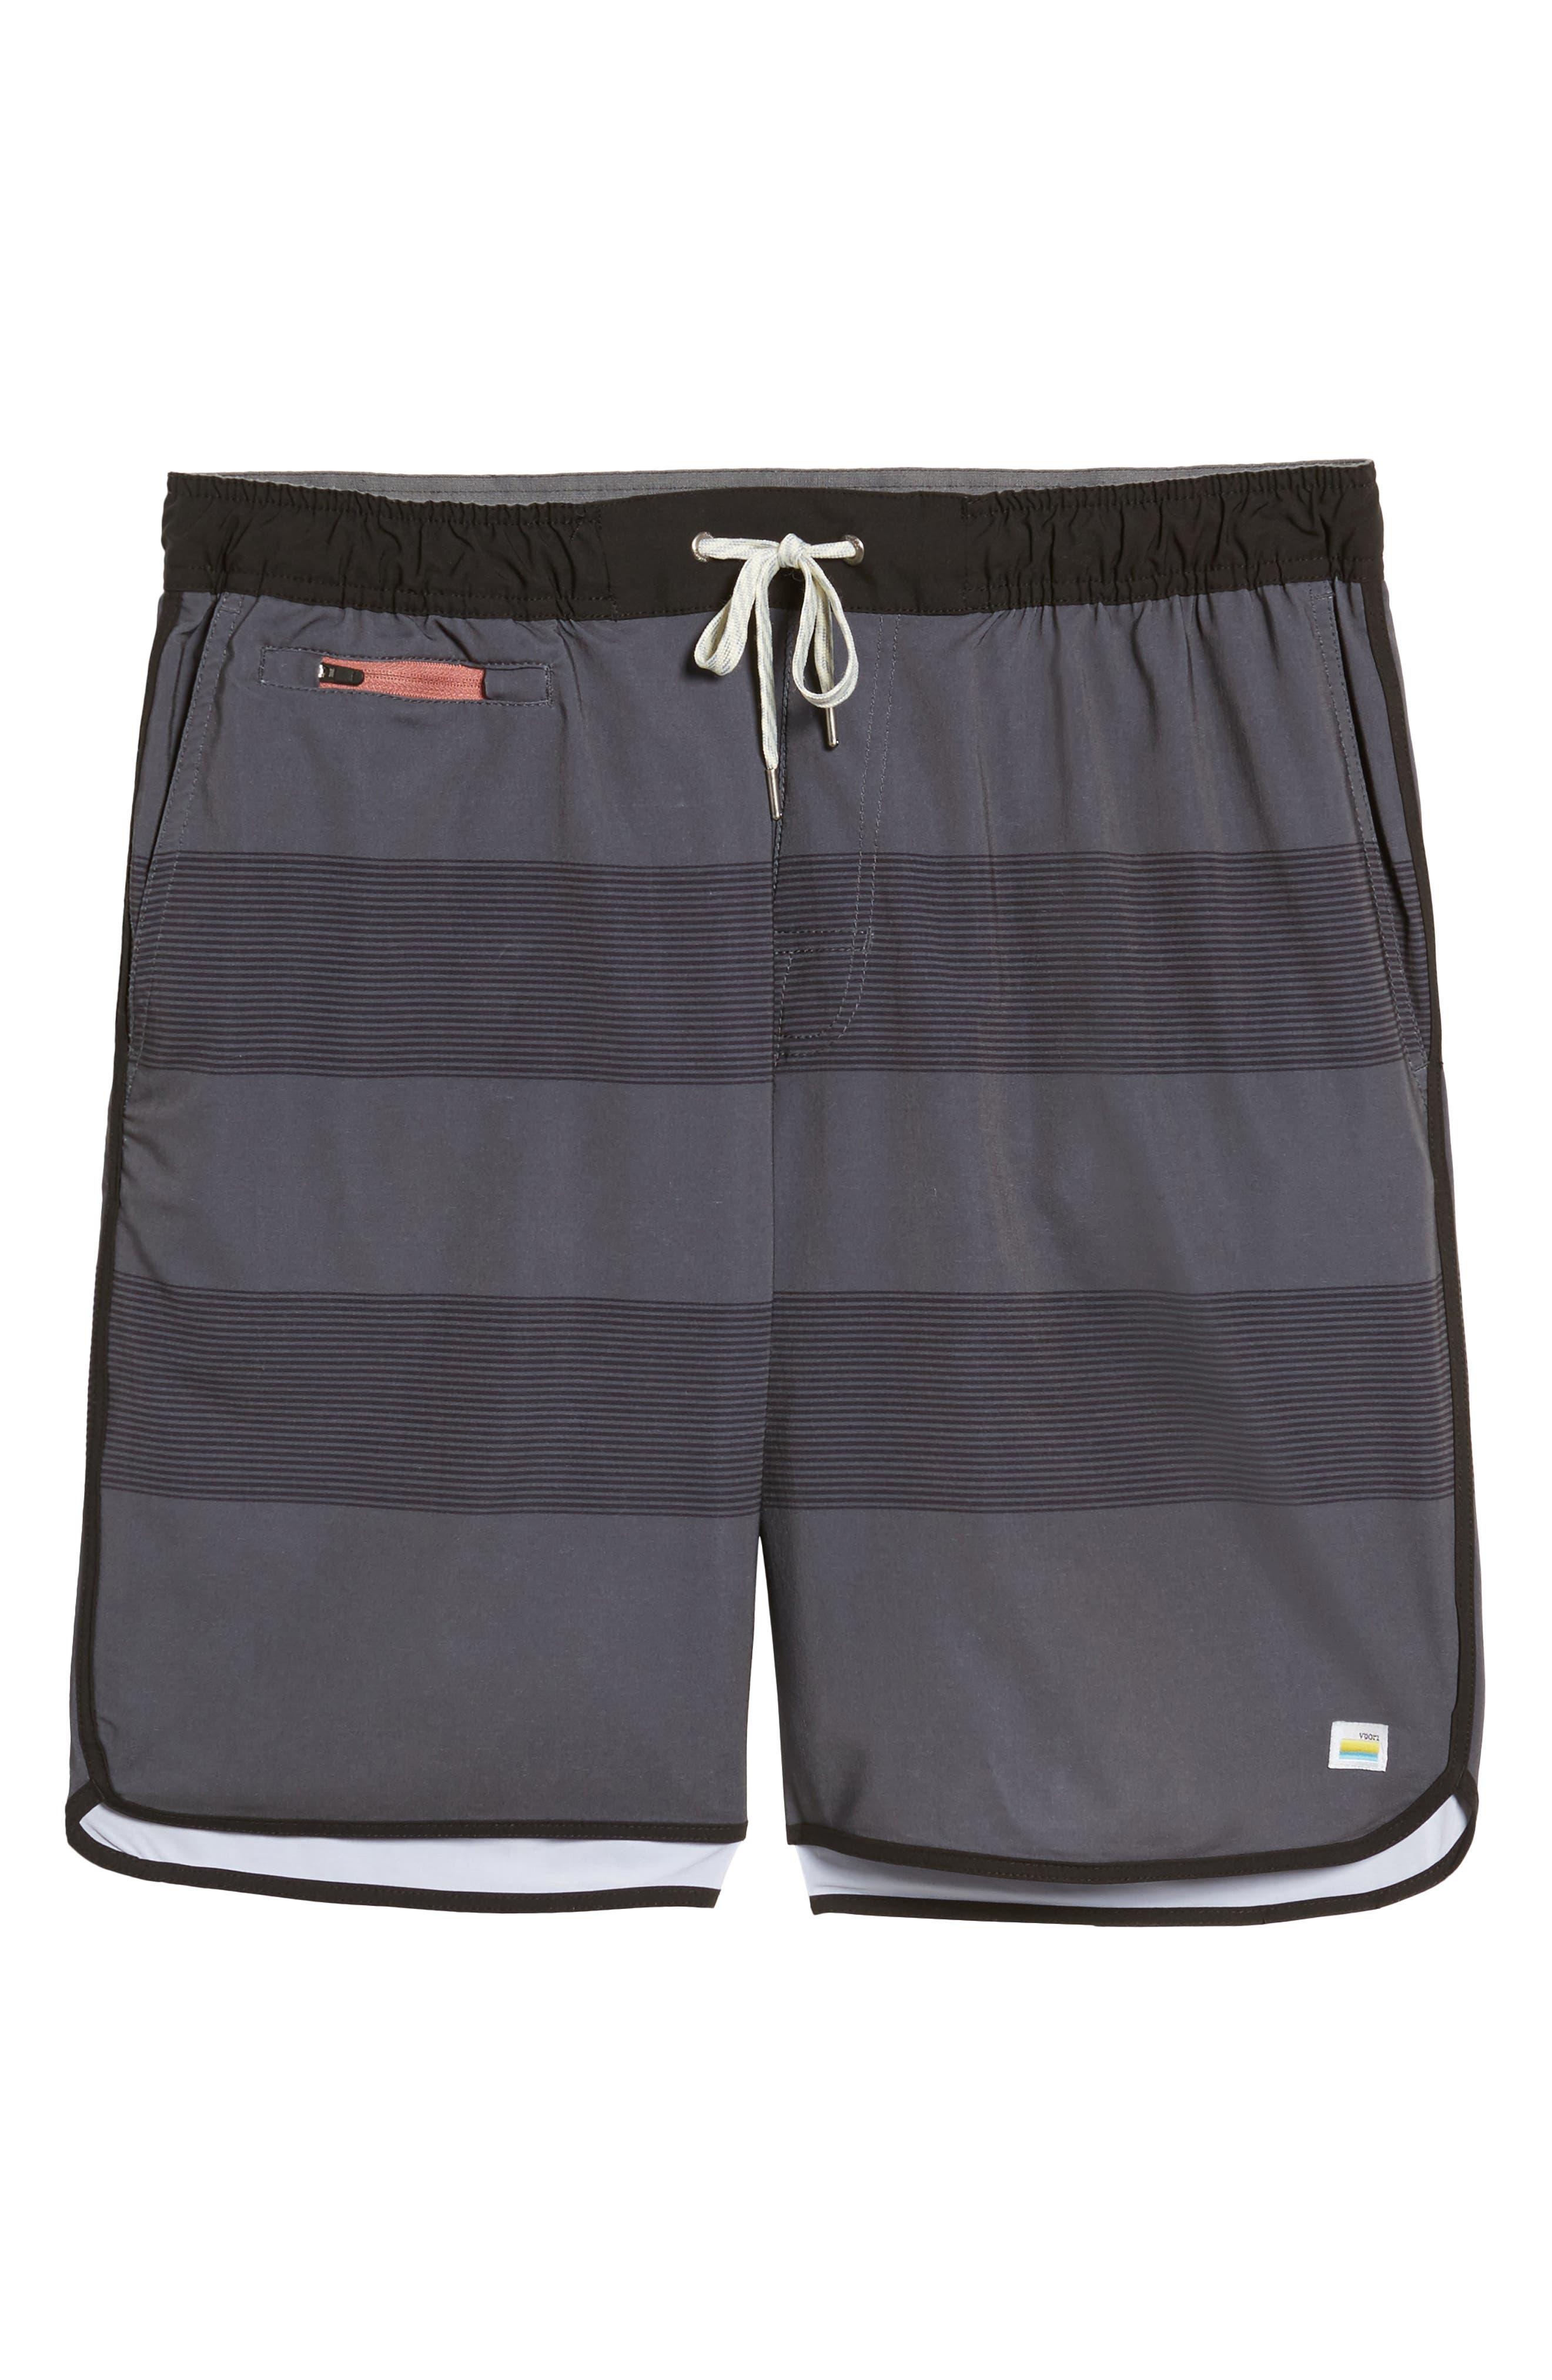 Banks Performance Hybrid Shorts,                             Alternate thumbnail 6, color,                             021